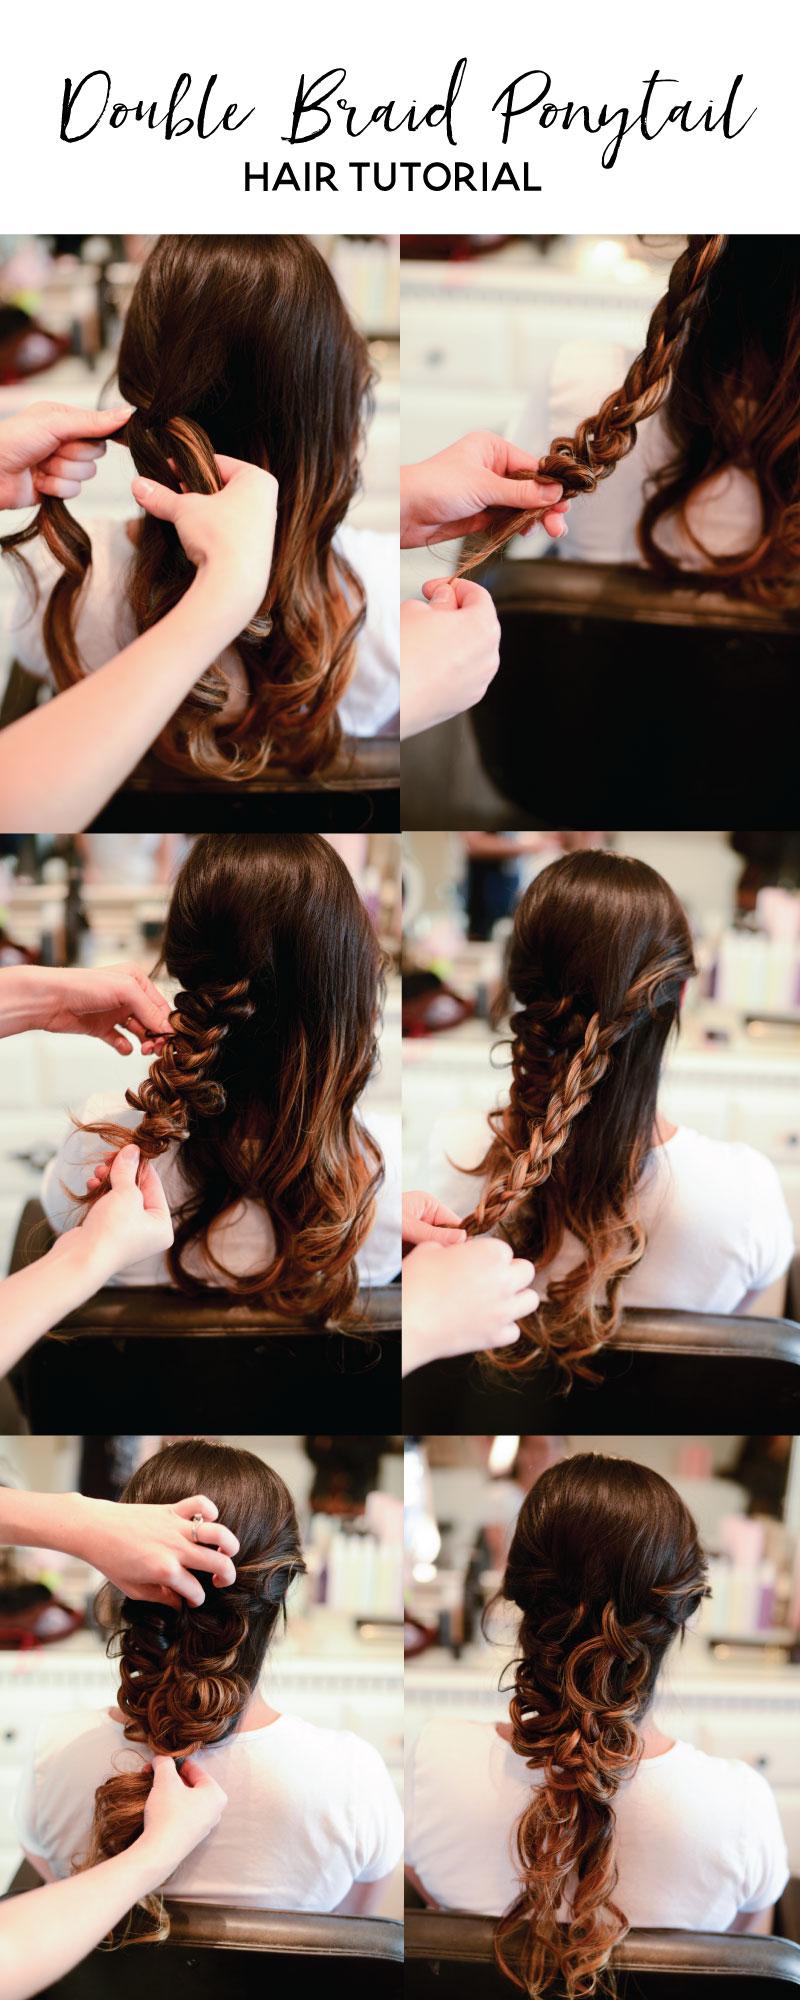 Double-Braid-Ponytail-Hair-Tutorial